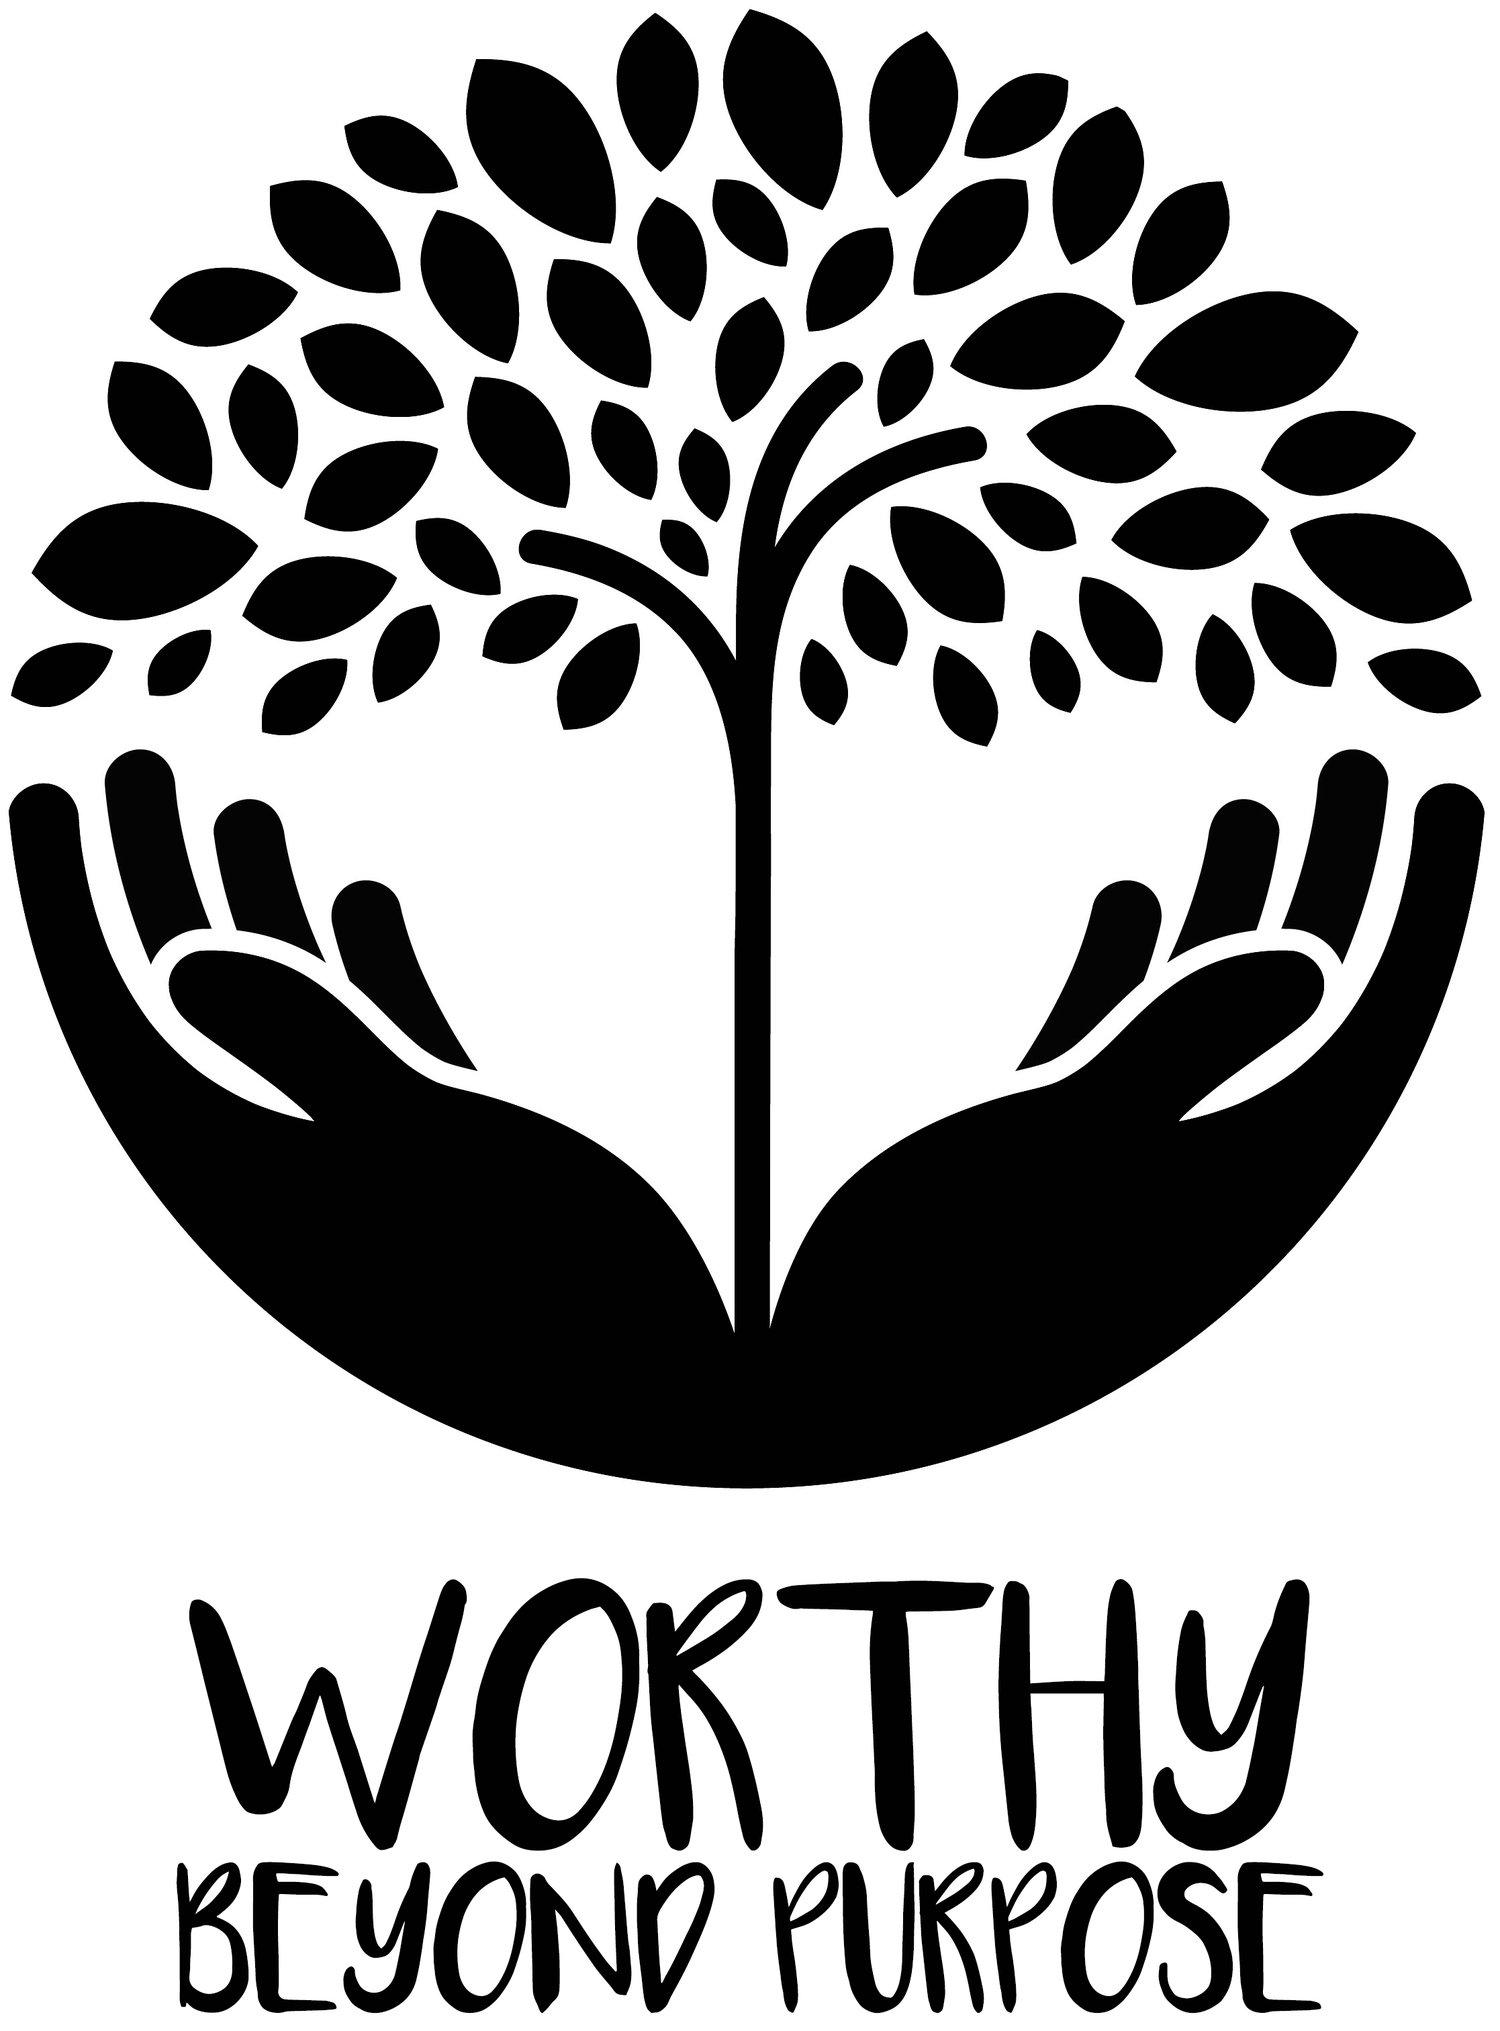 Worthy Beyond Purpose